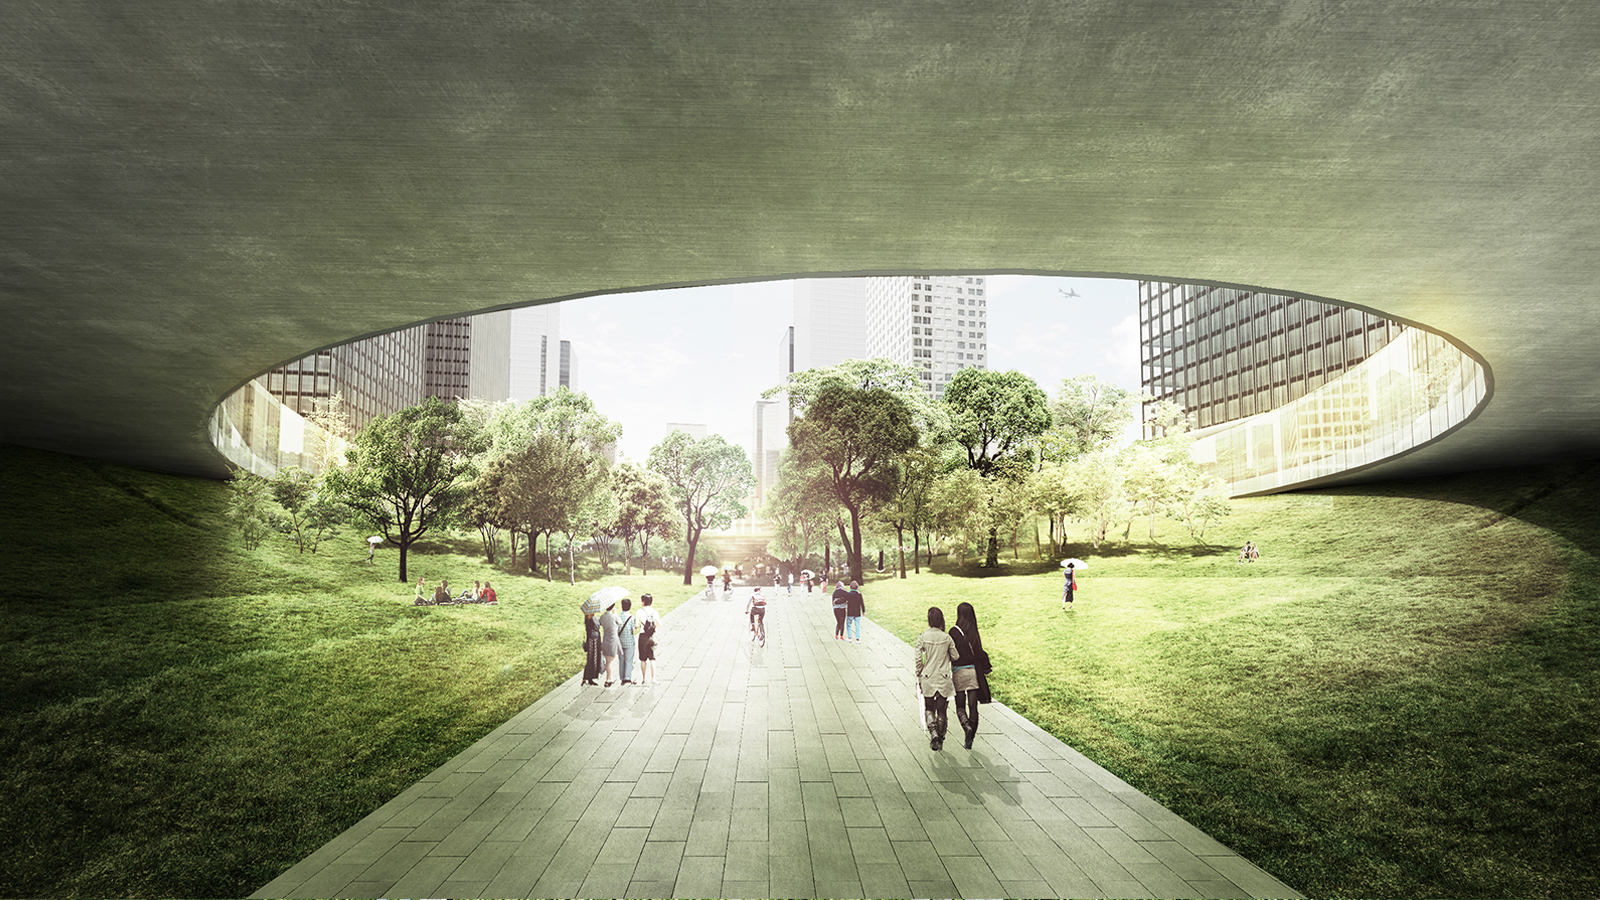 MJZ_Qianhai-Exchange-Plaza (4)